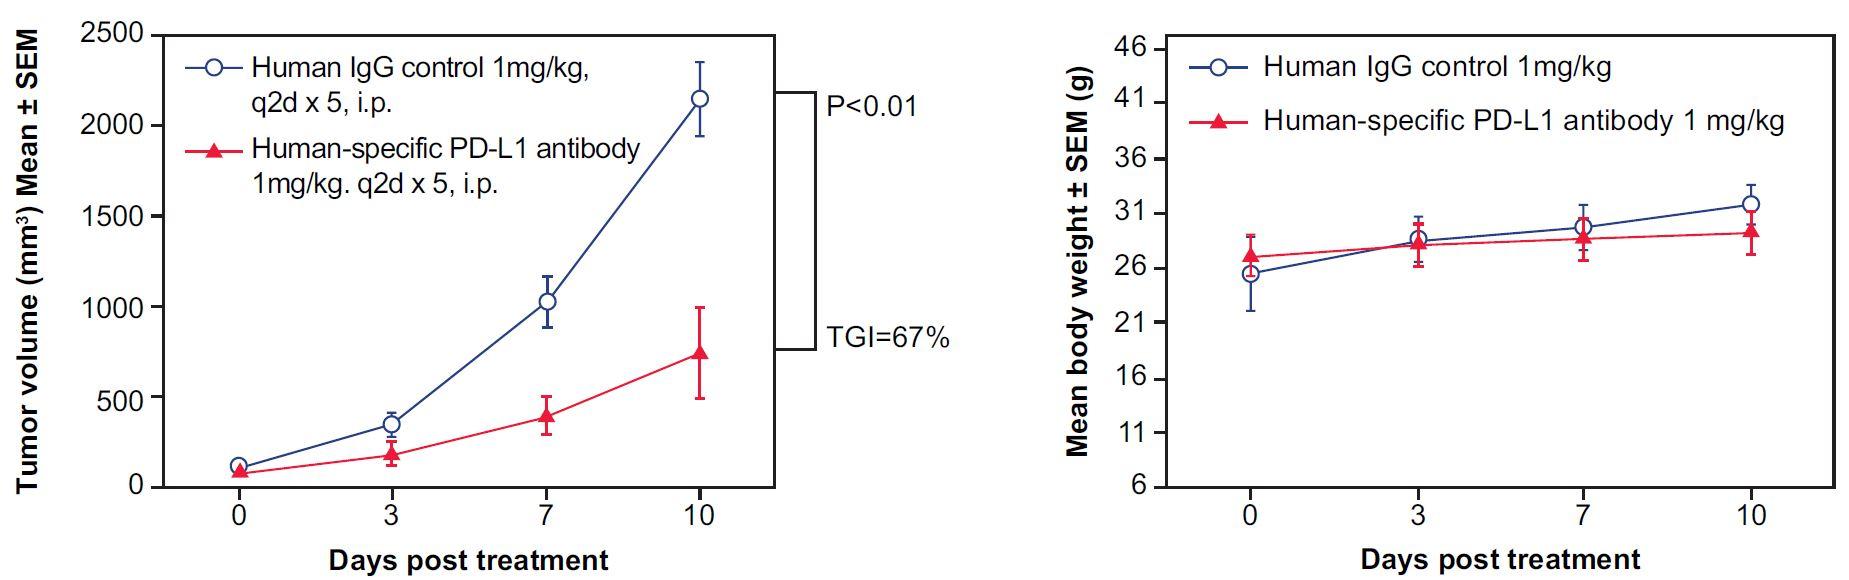 appnote-animalmodel-mouserepository-humanicp-pd-l1-1